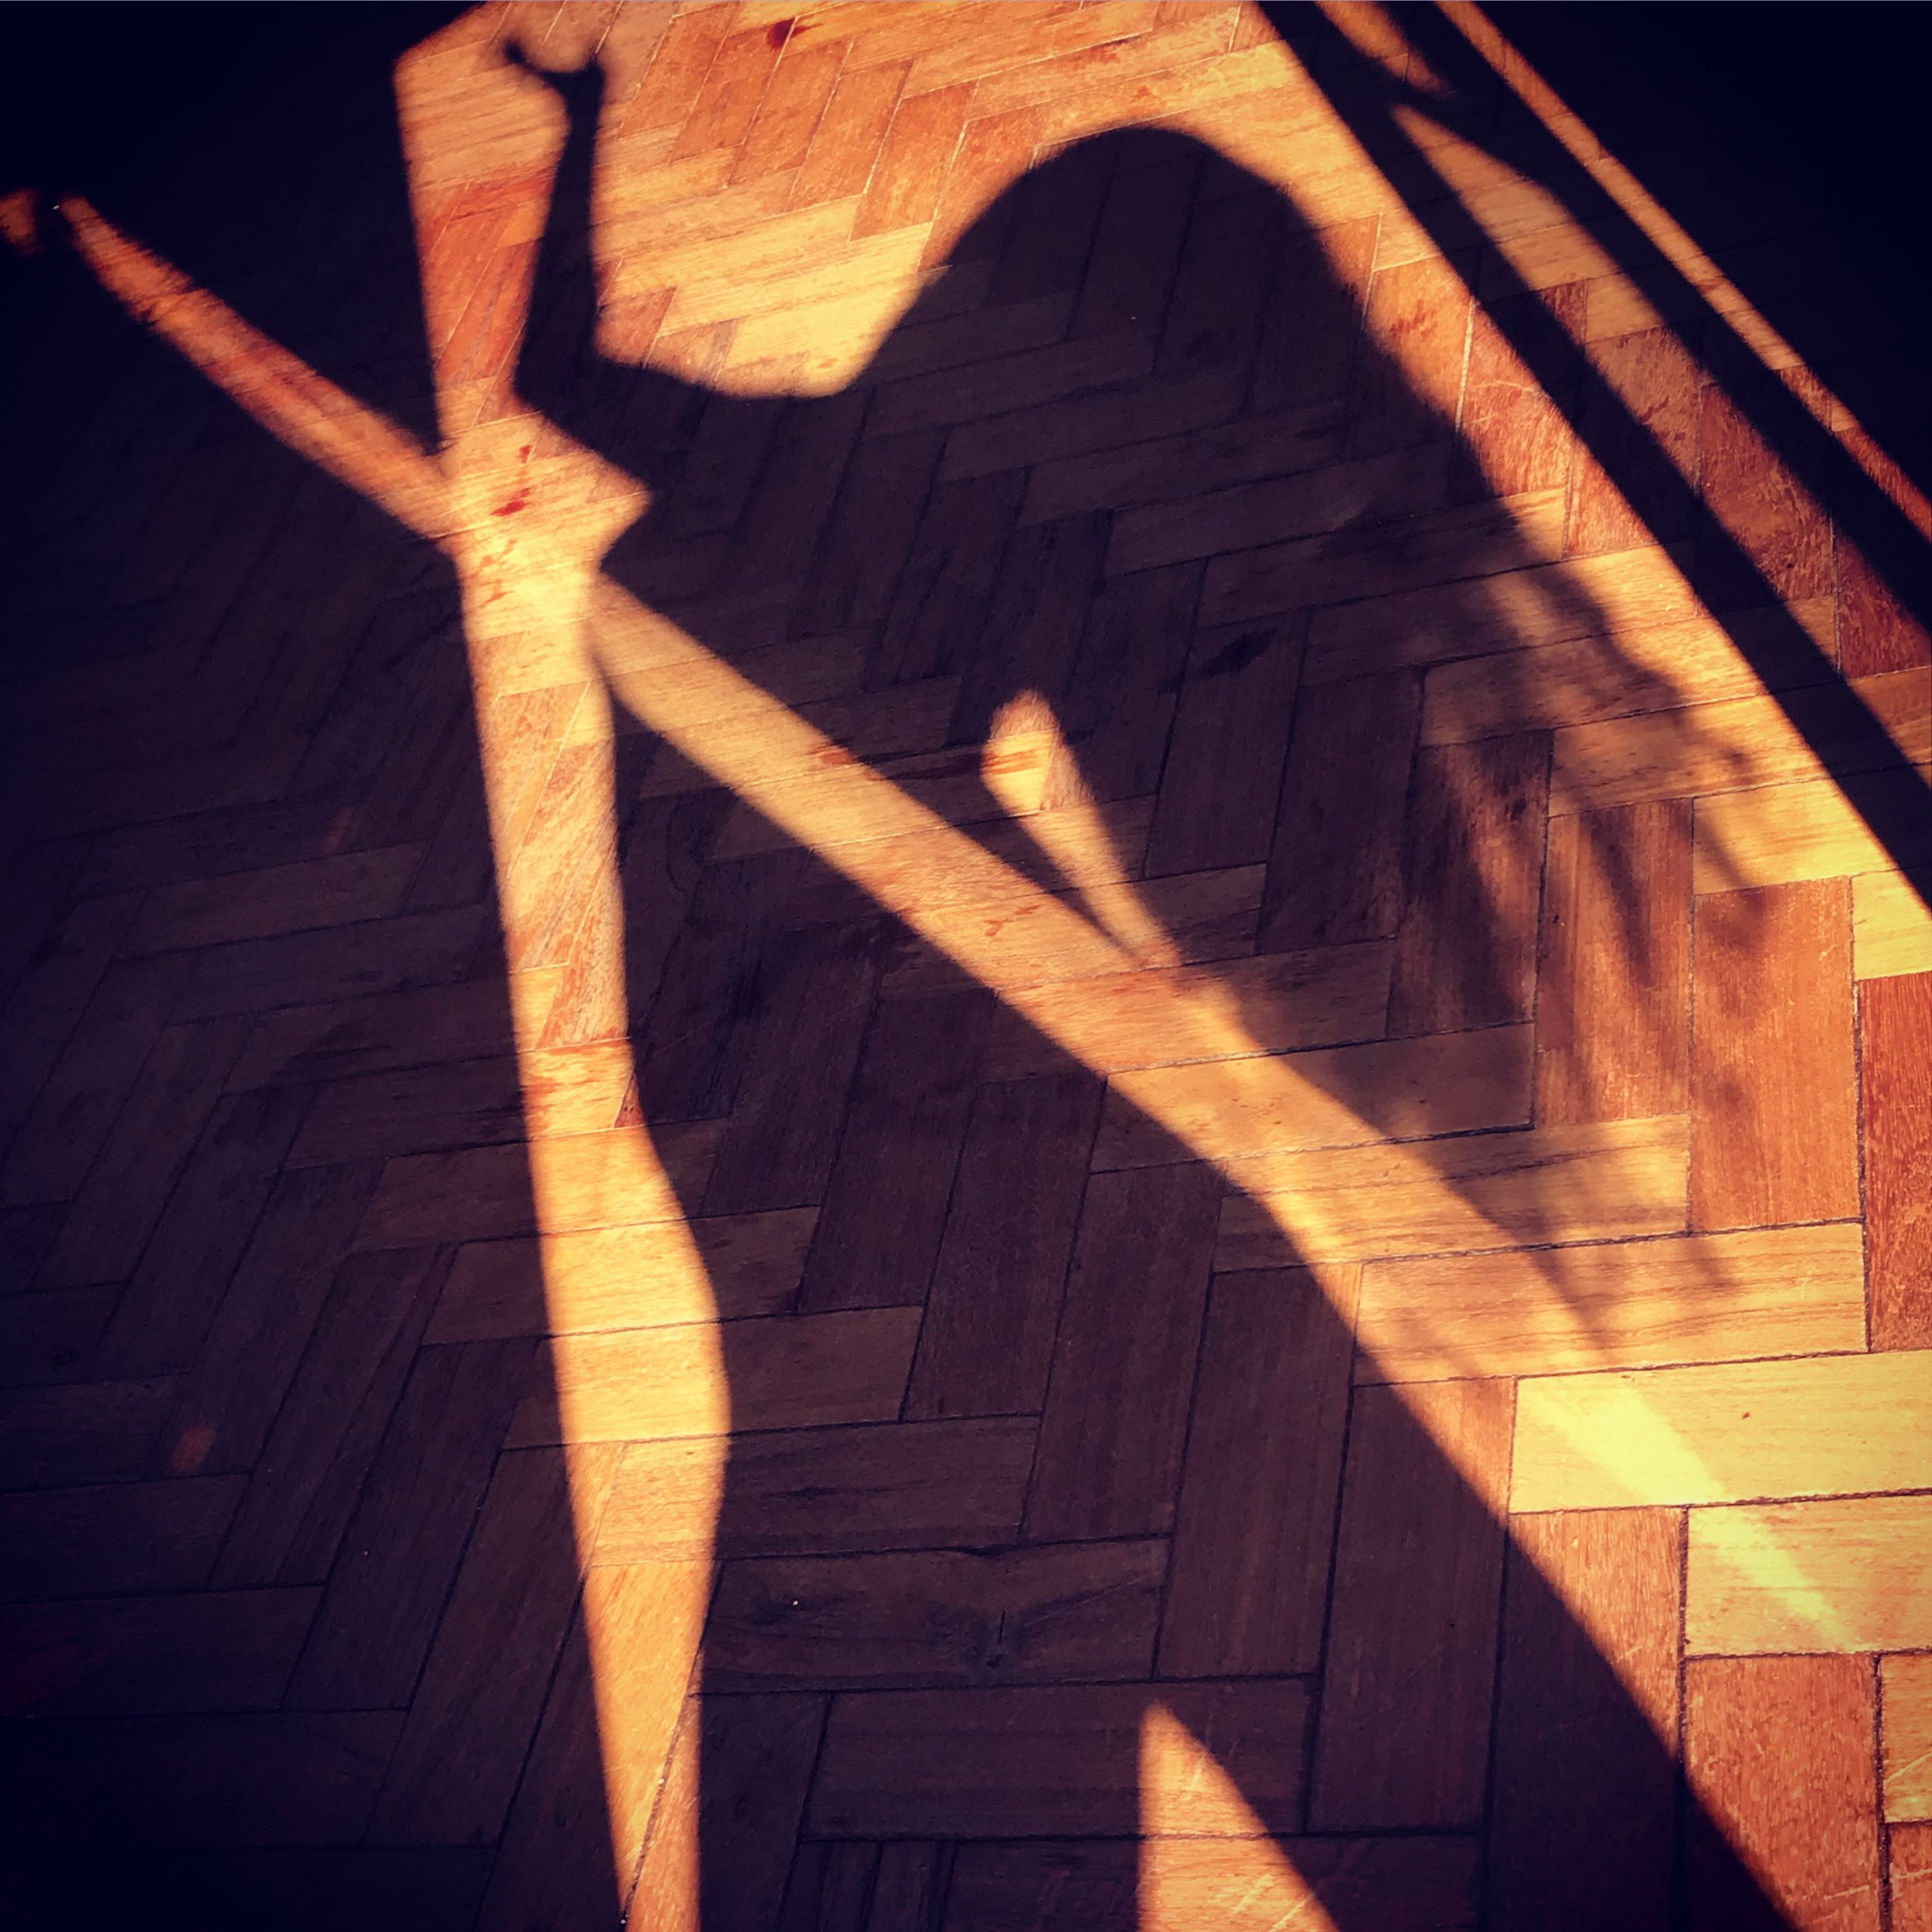 Shadow & Light Play - Lisbon